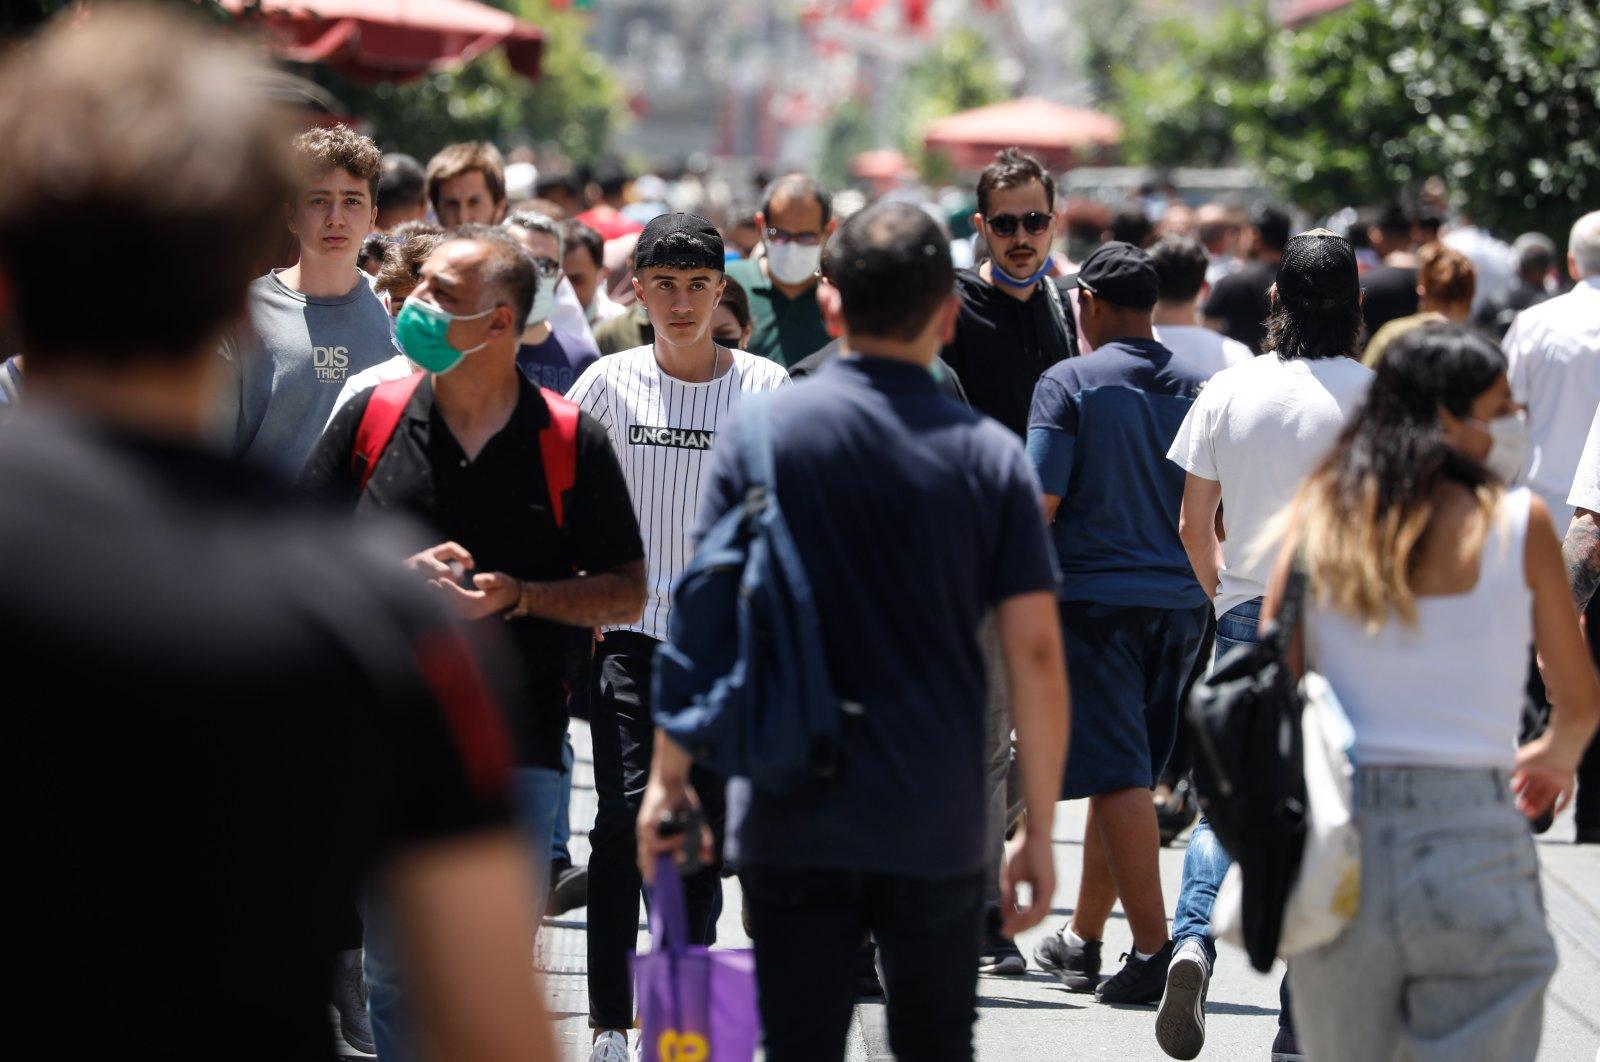 People walking on Istiklal Street, in Istanbul, Turkey, on June 28, 2021. (DHA Photo)